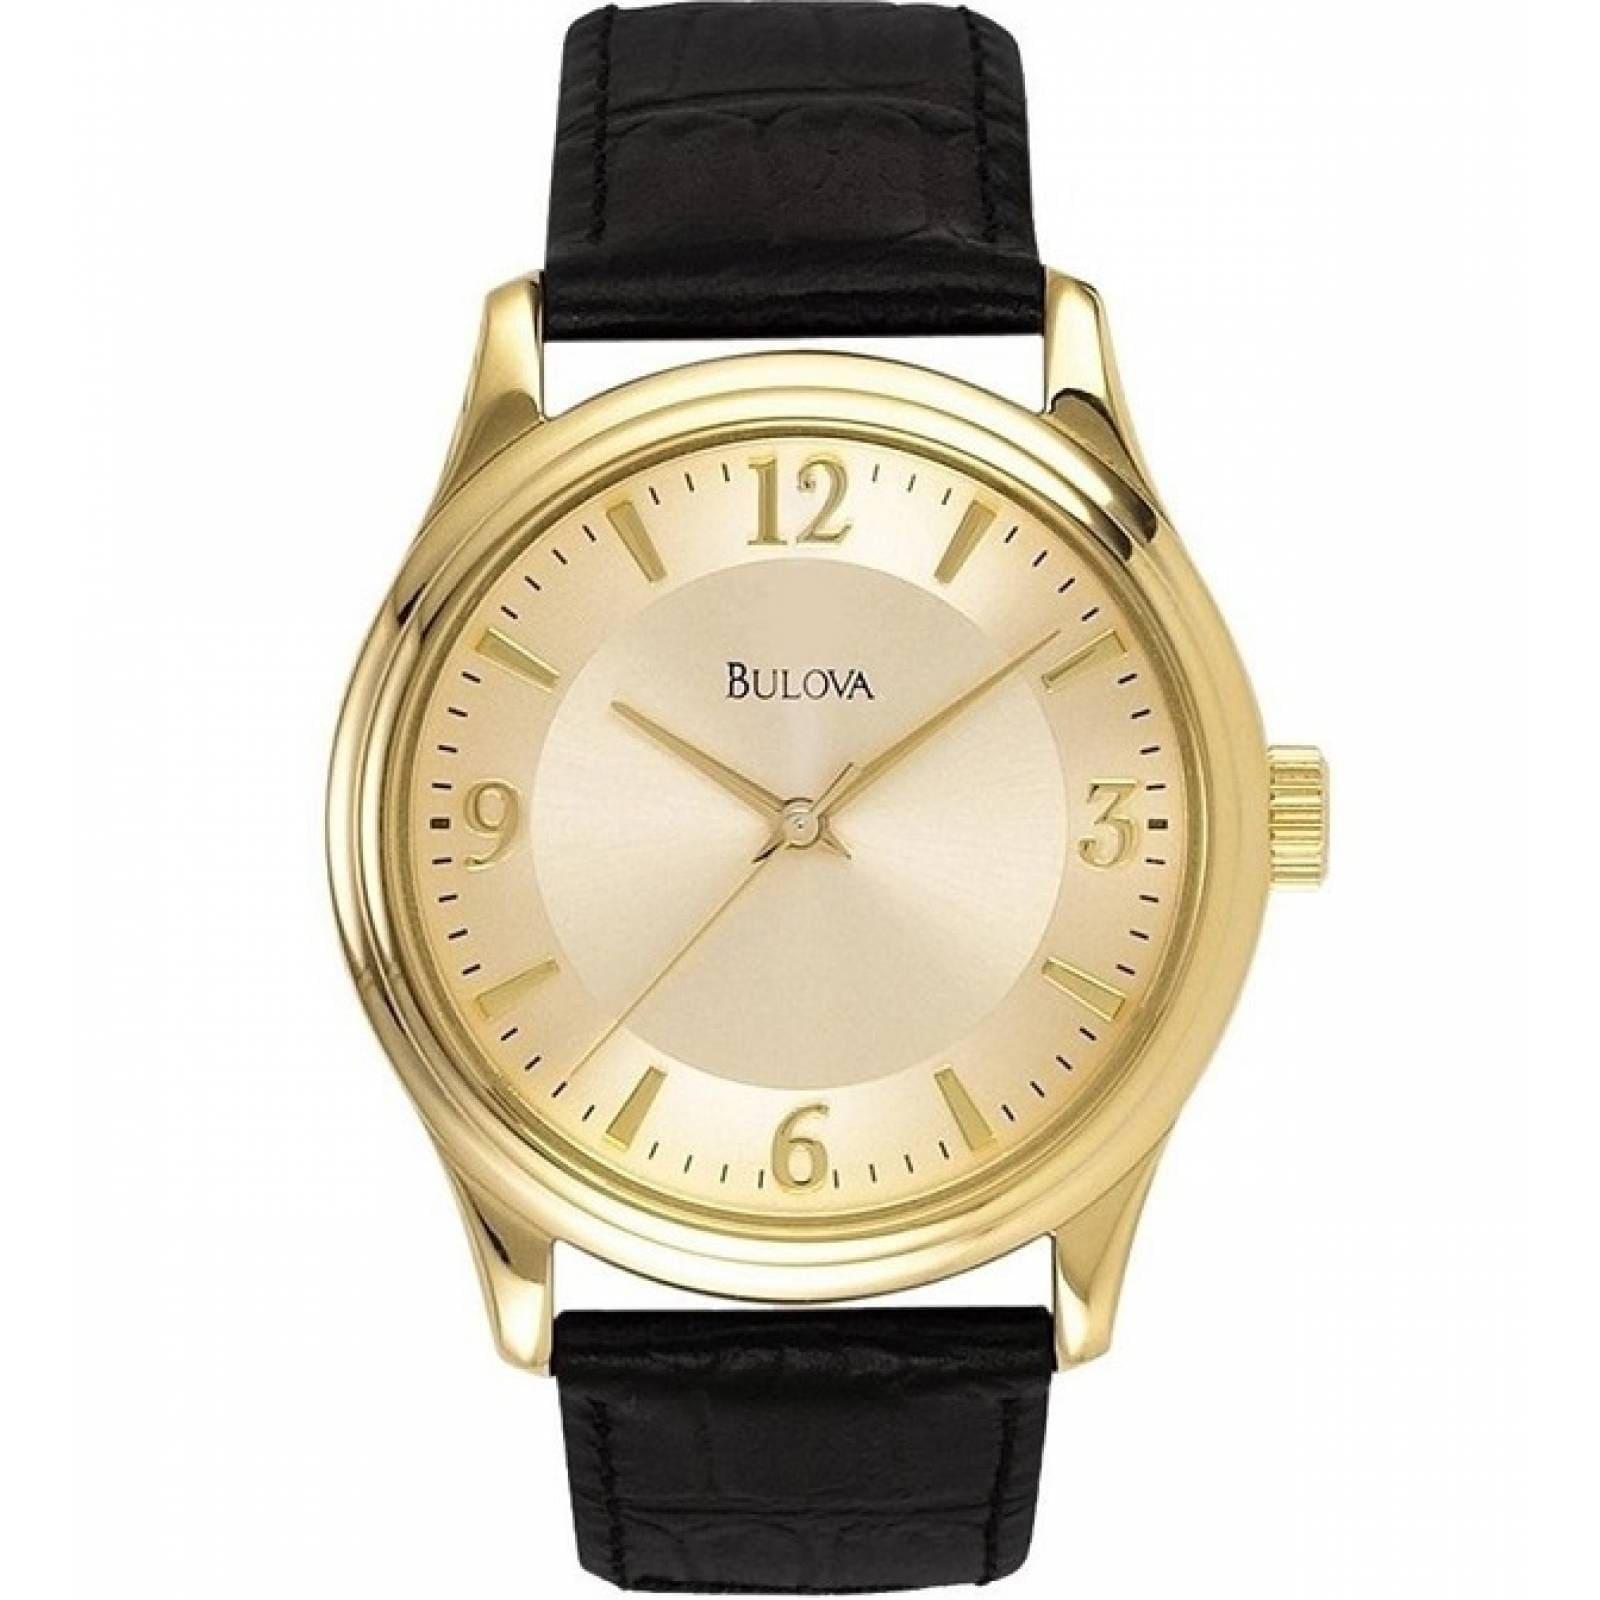 Reloj Bulova para CABALLERO Modelo: 97A70